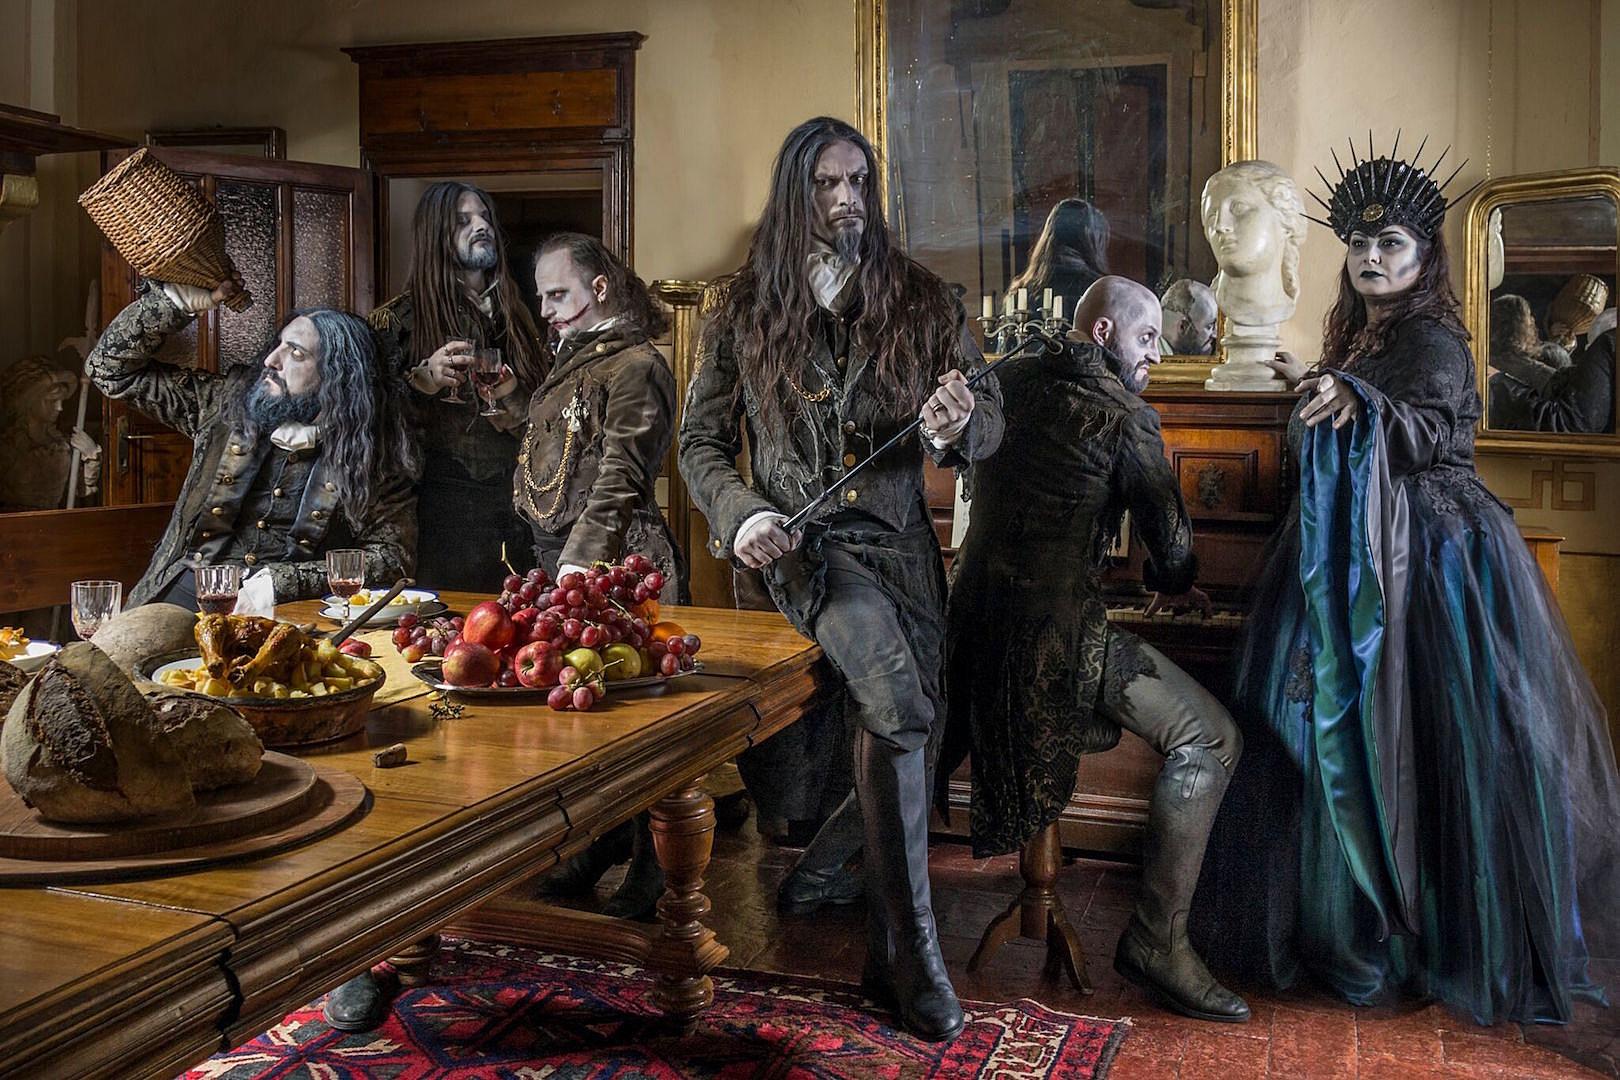 Fleshgod Apocalypse Recruit Classical Quartet for 2020 Tour